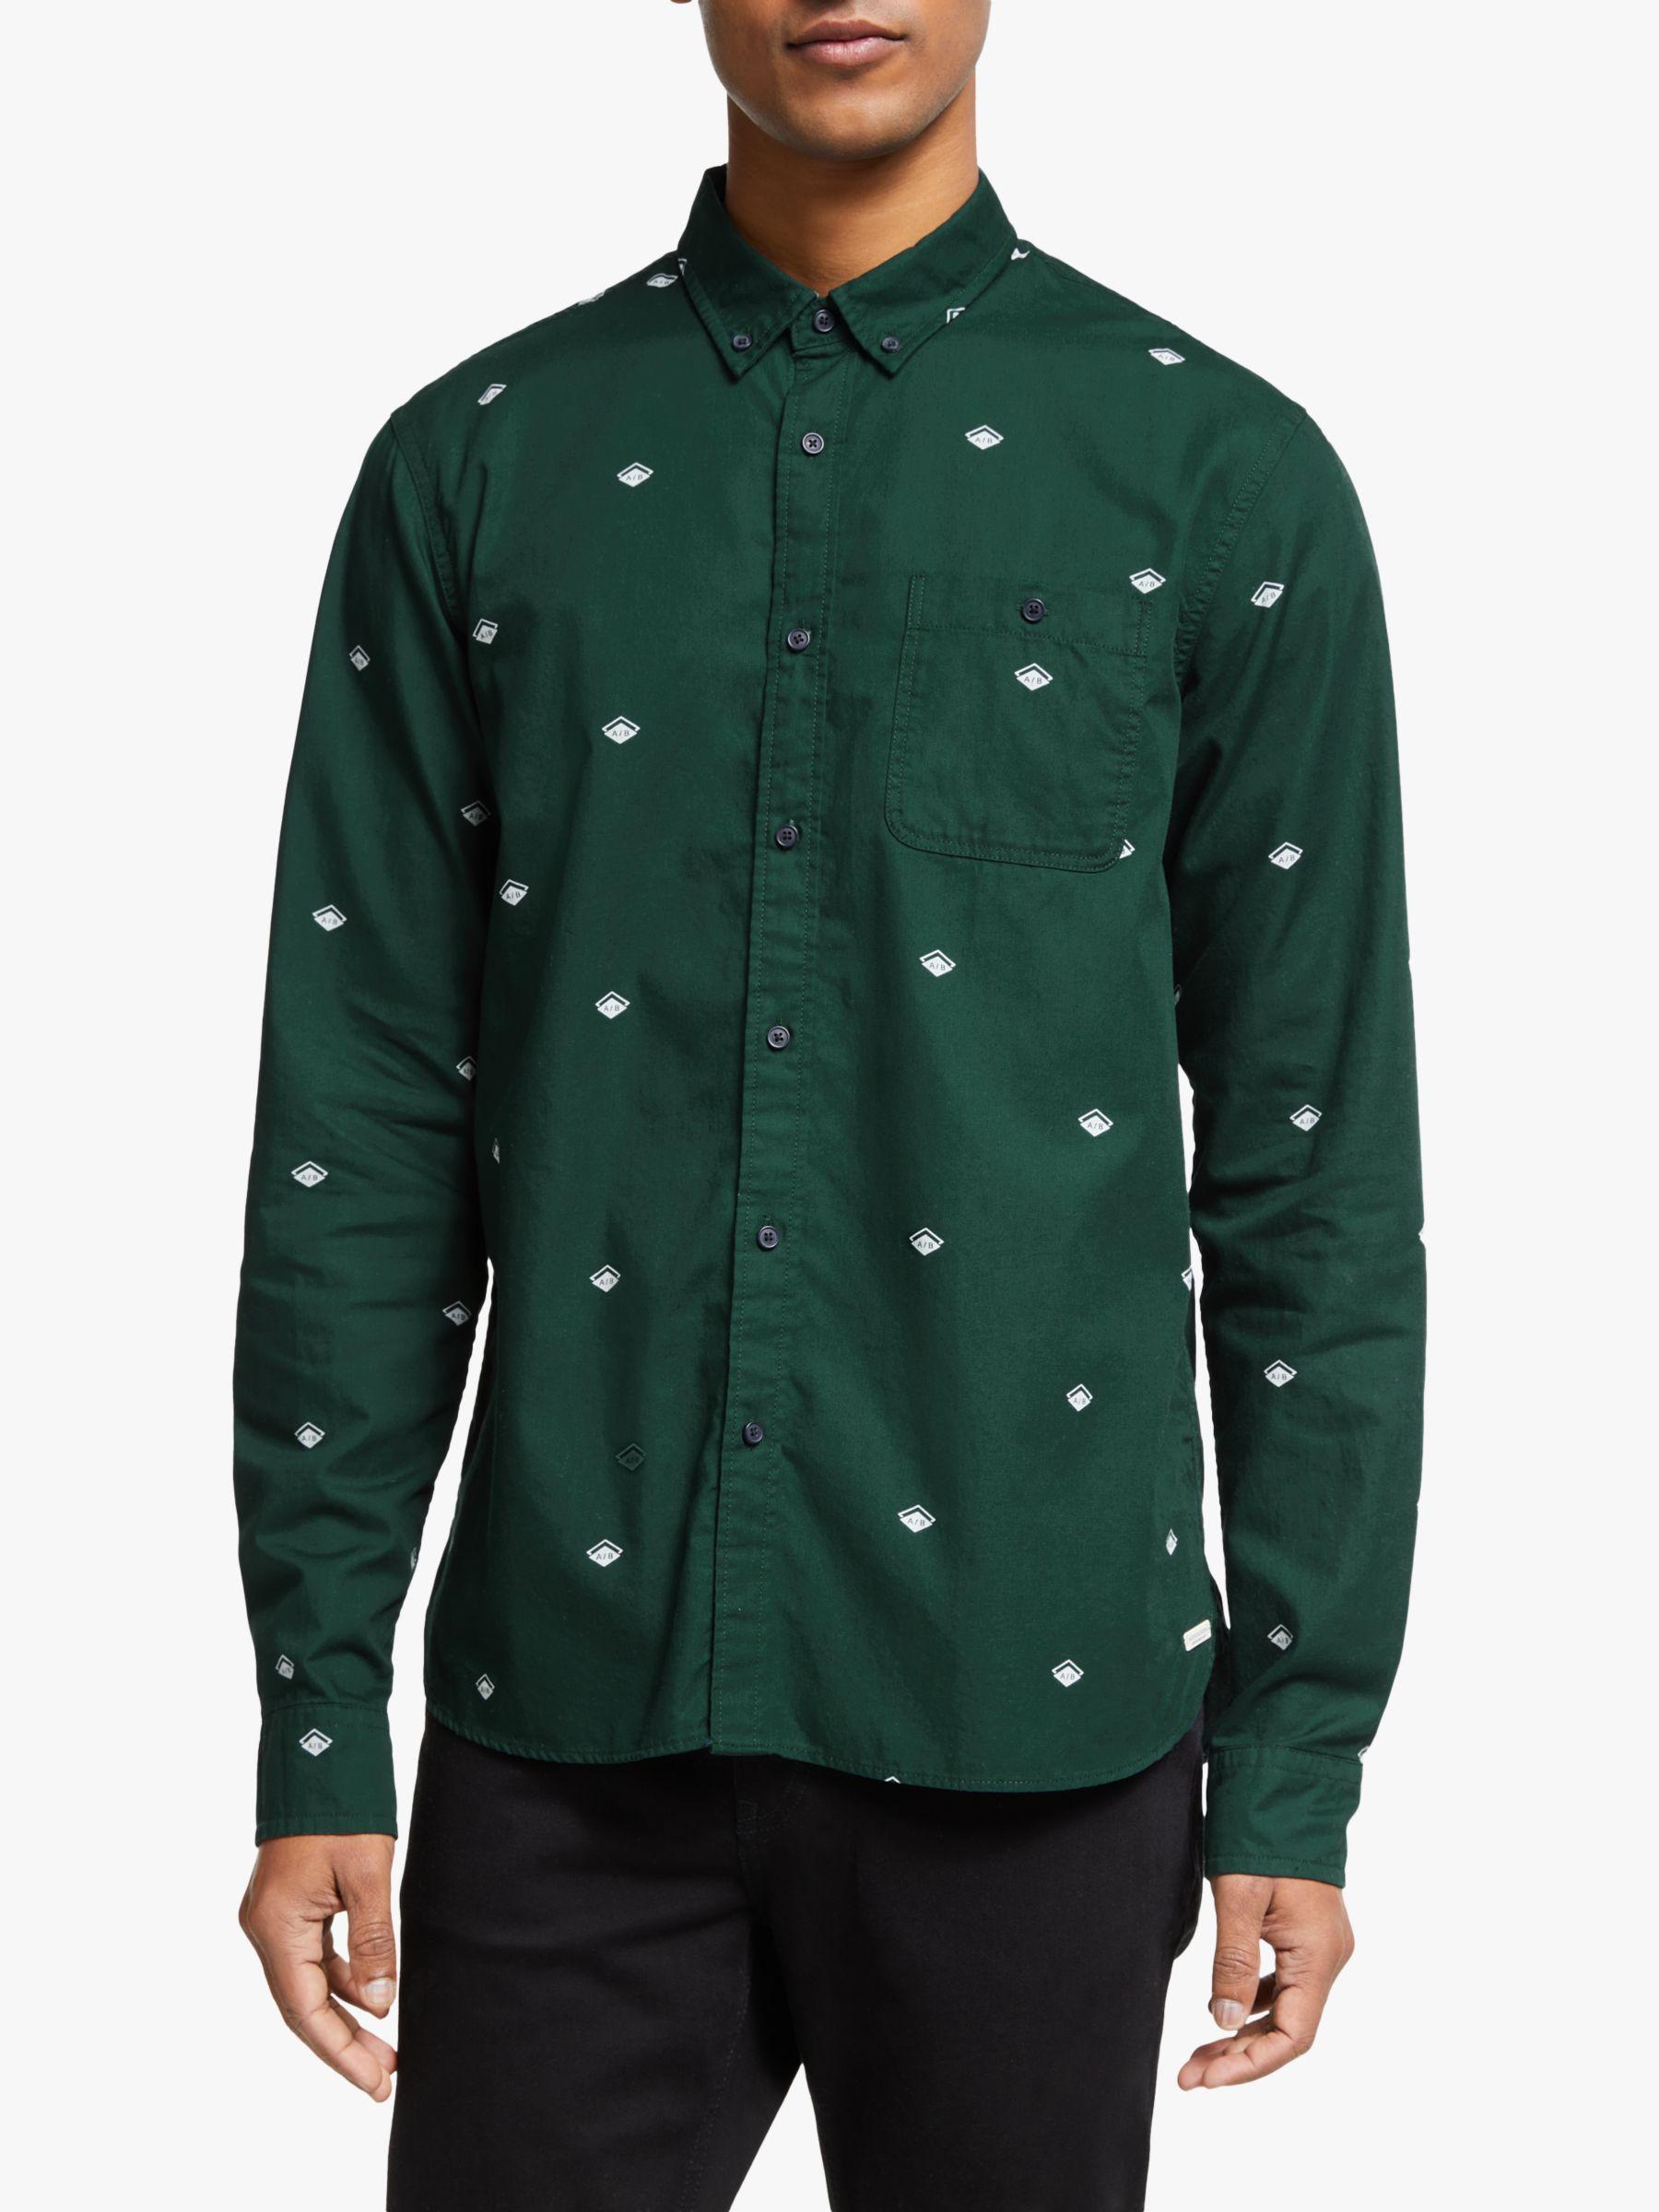 Scotch & Soda Scotch & Soda Abstract Print Shirt, Green